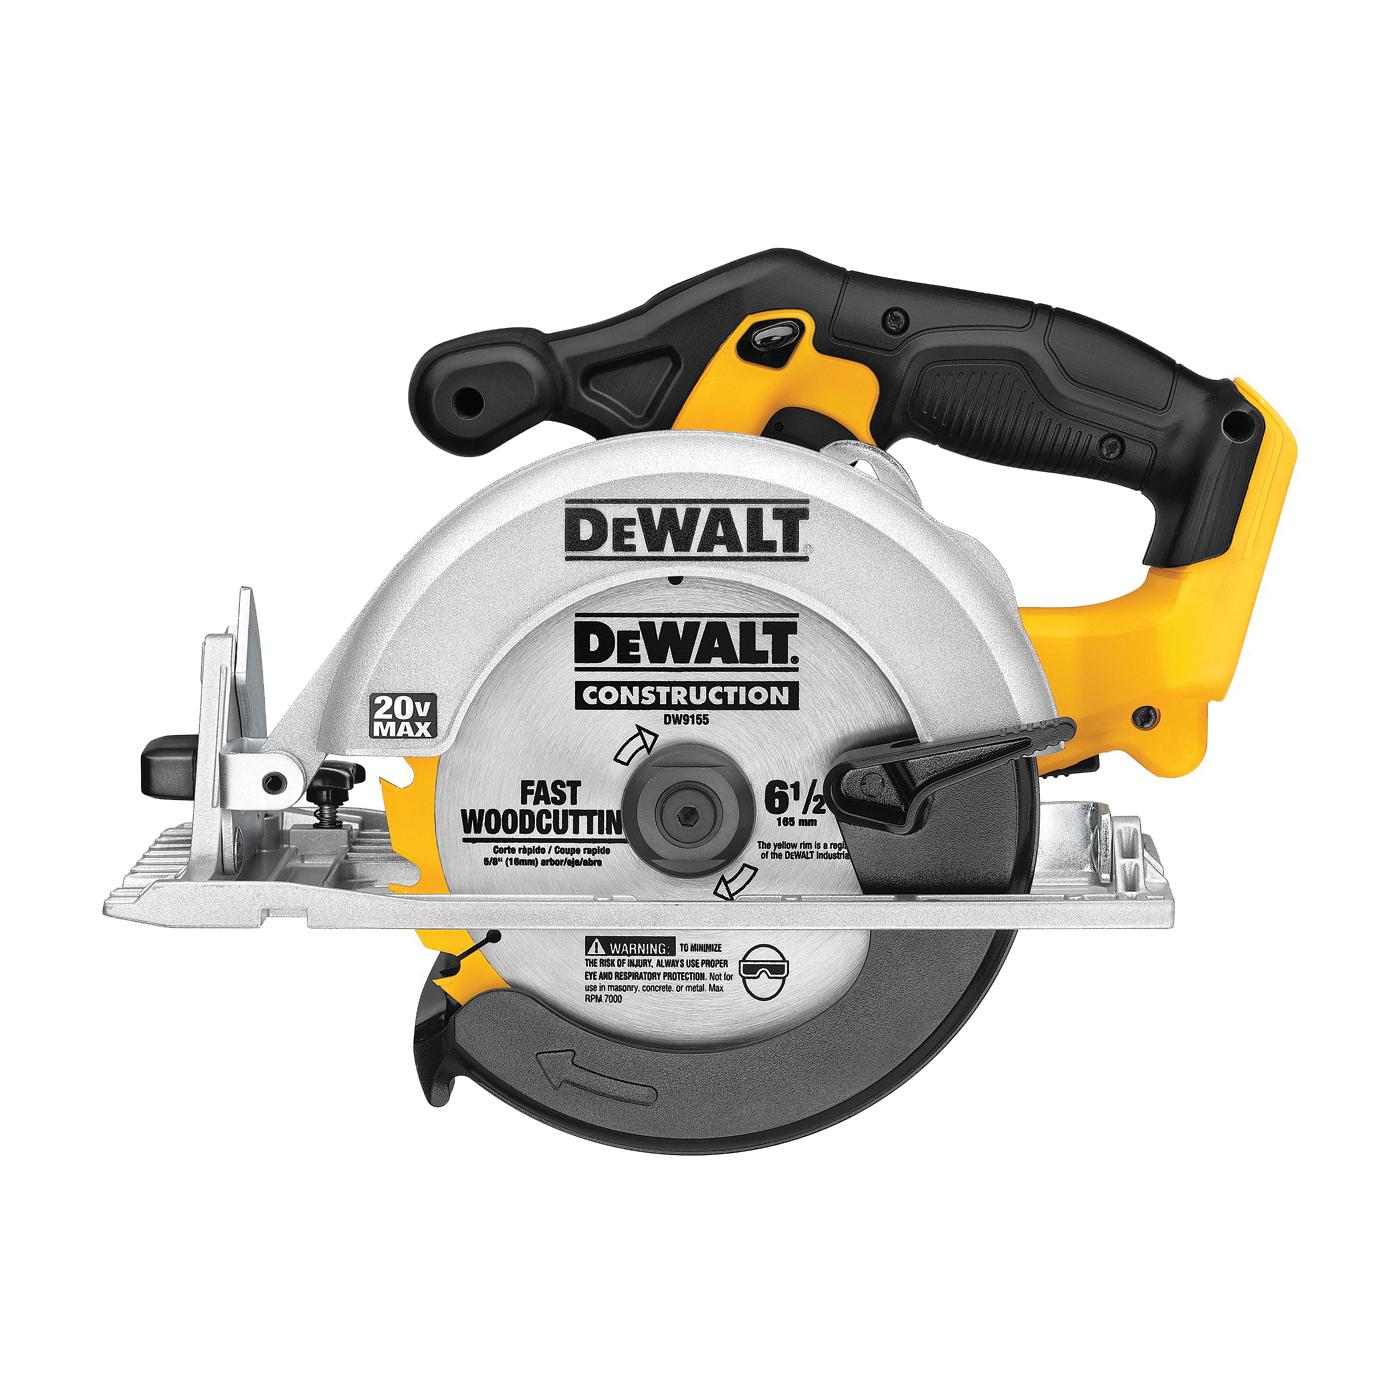 Picture of DeWALT DCS391B Circular Saw, Bare Tool, 20 V Battery, 6-1/2 in Dia Blade, 50 deg Bevel, 5150 rpm Speed